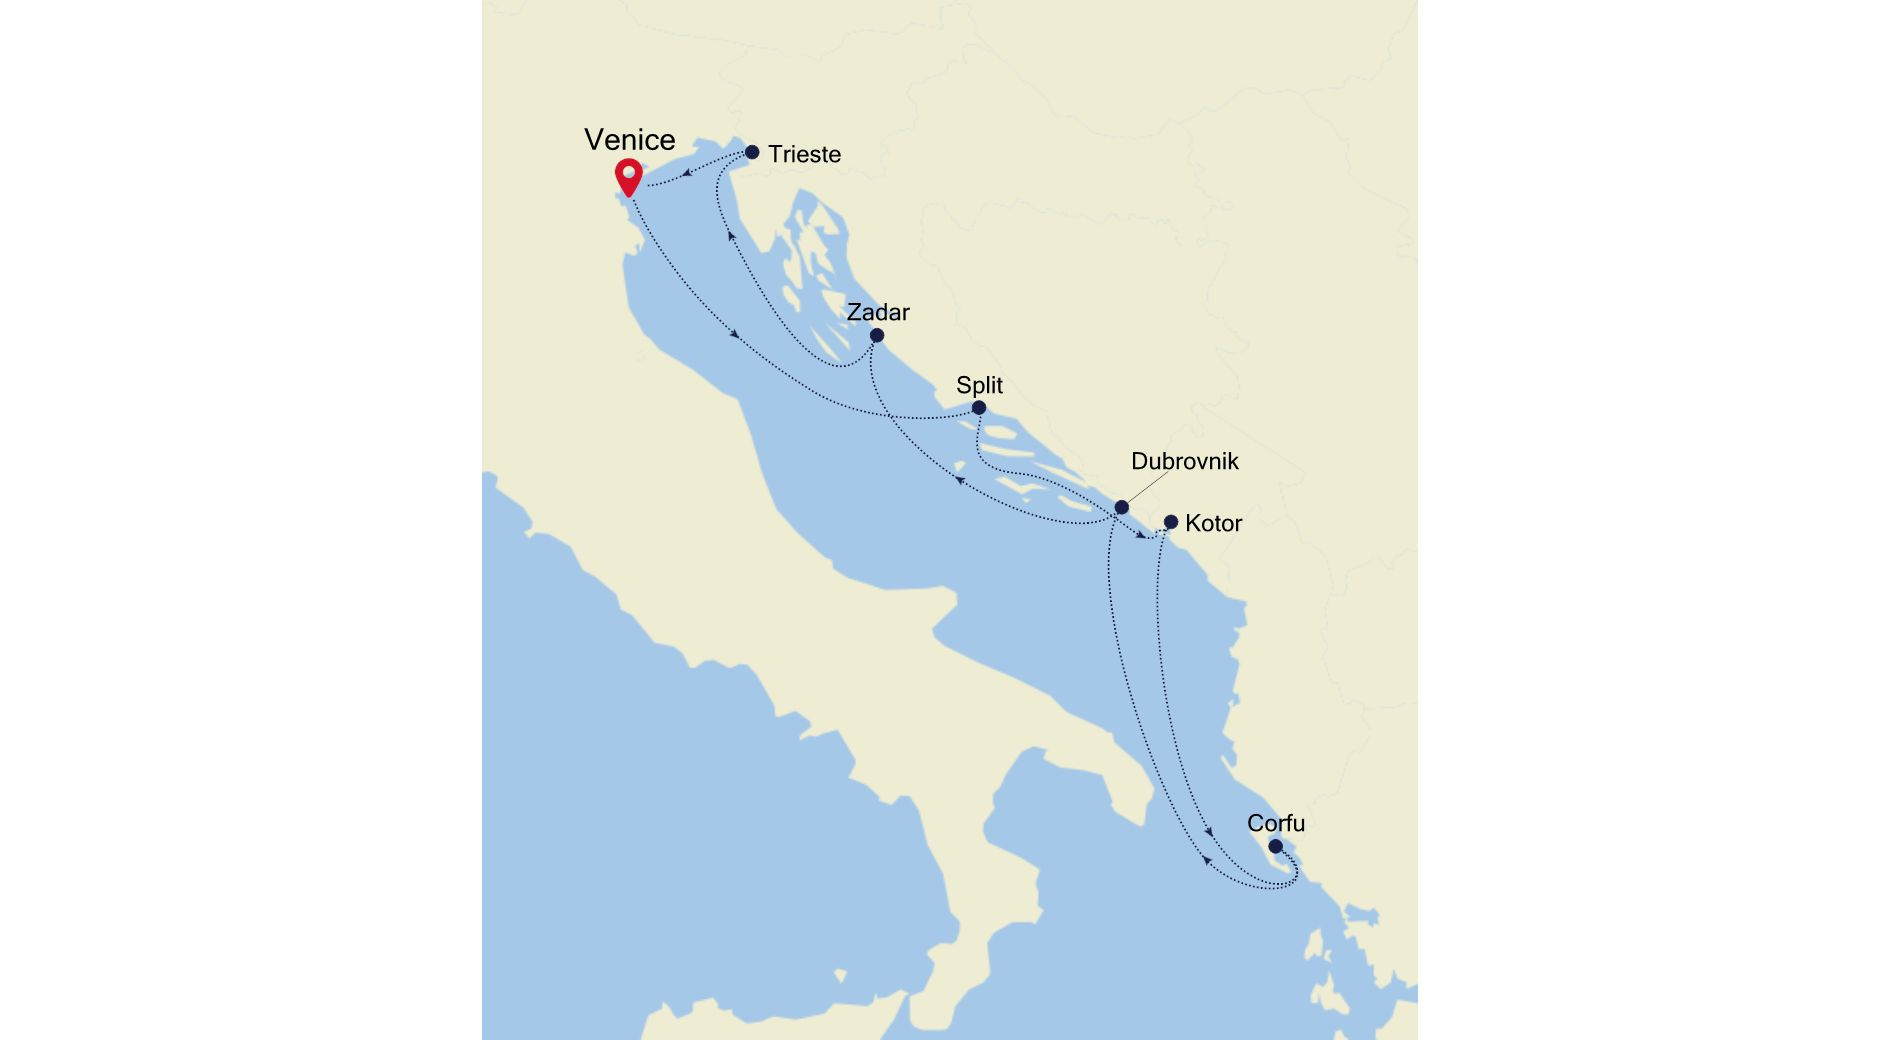 MO210902007 - Venice nach Venice